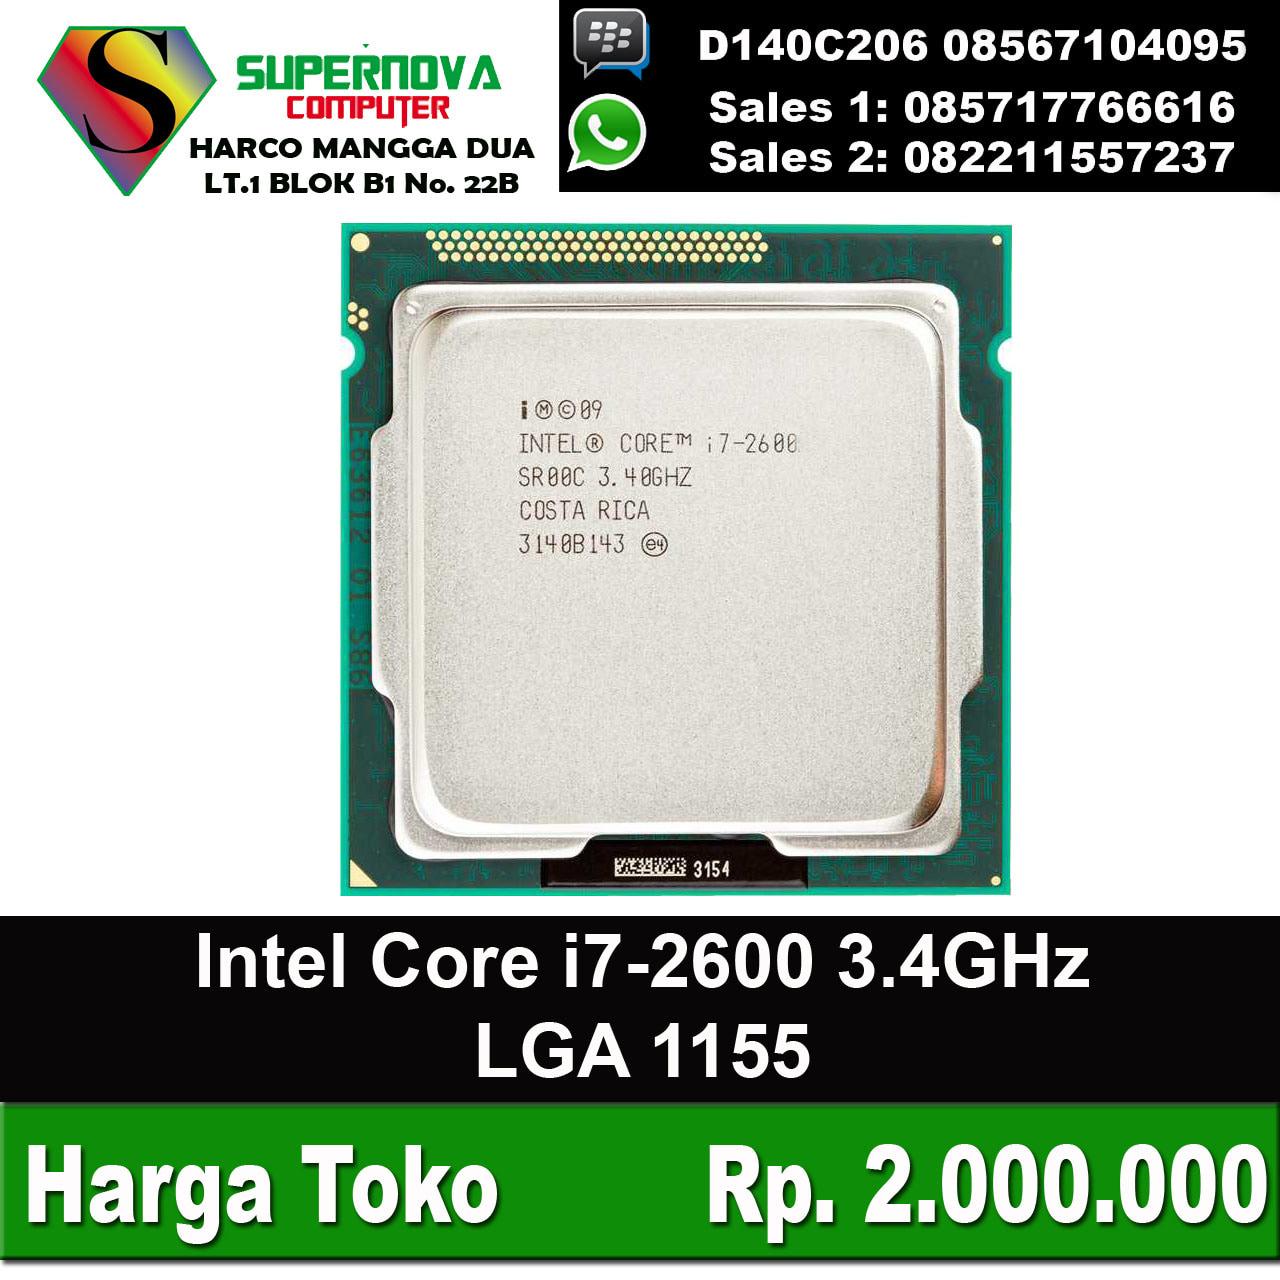 Harga Intel Core I7 Lga 1155 Karmashares Llc Leveraging 4790 34 Box Socket 1150 Jual Processor 2600 34ghz Tray Supernova Computer Ariet